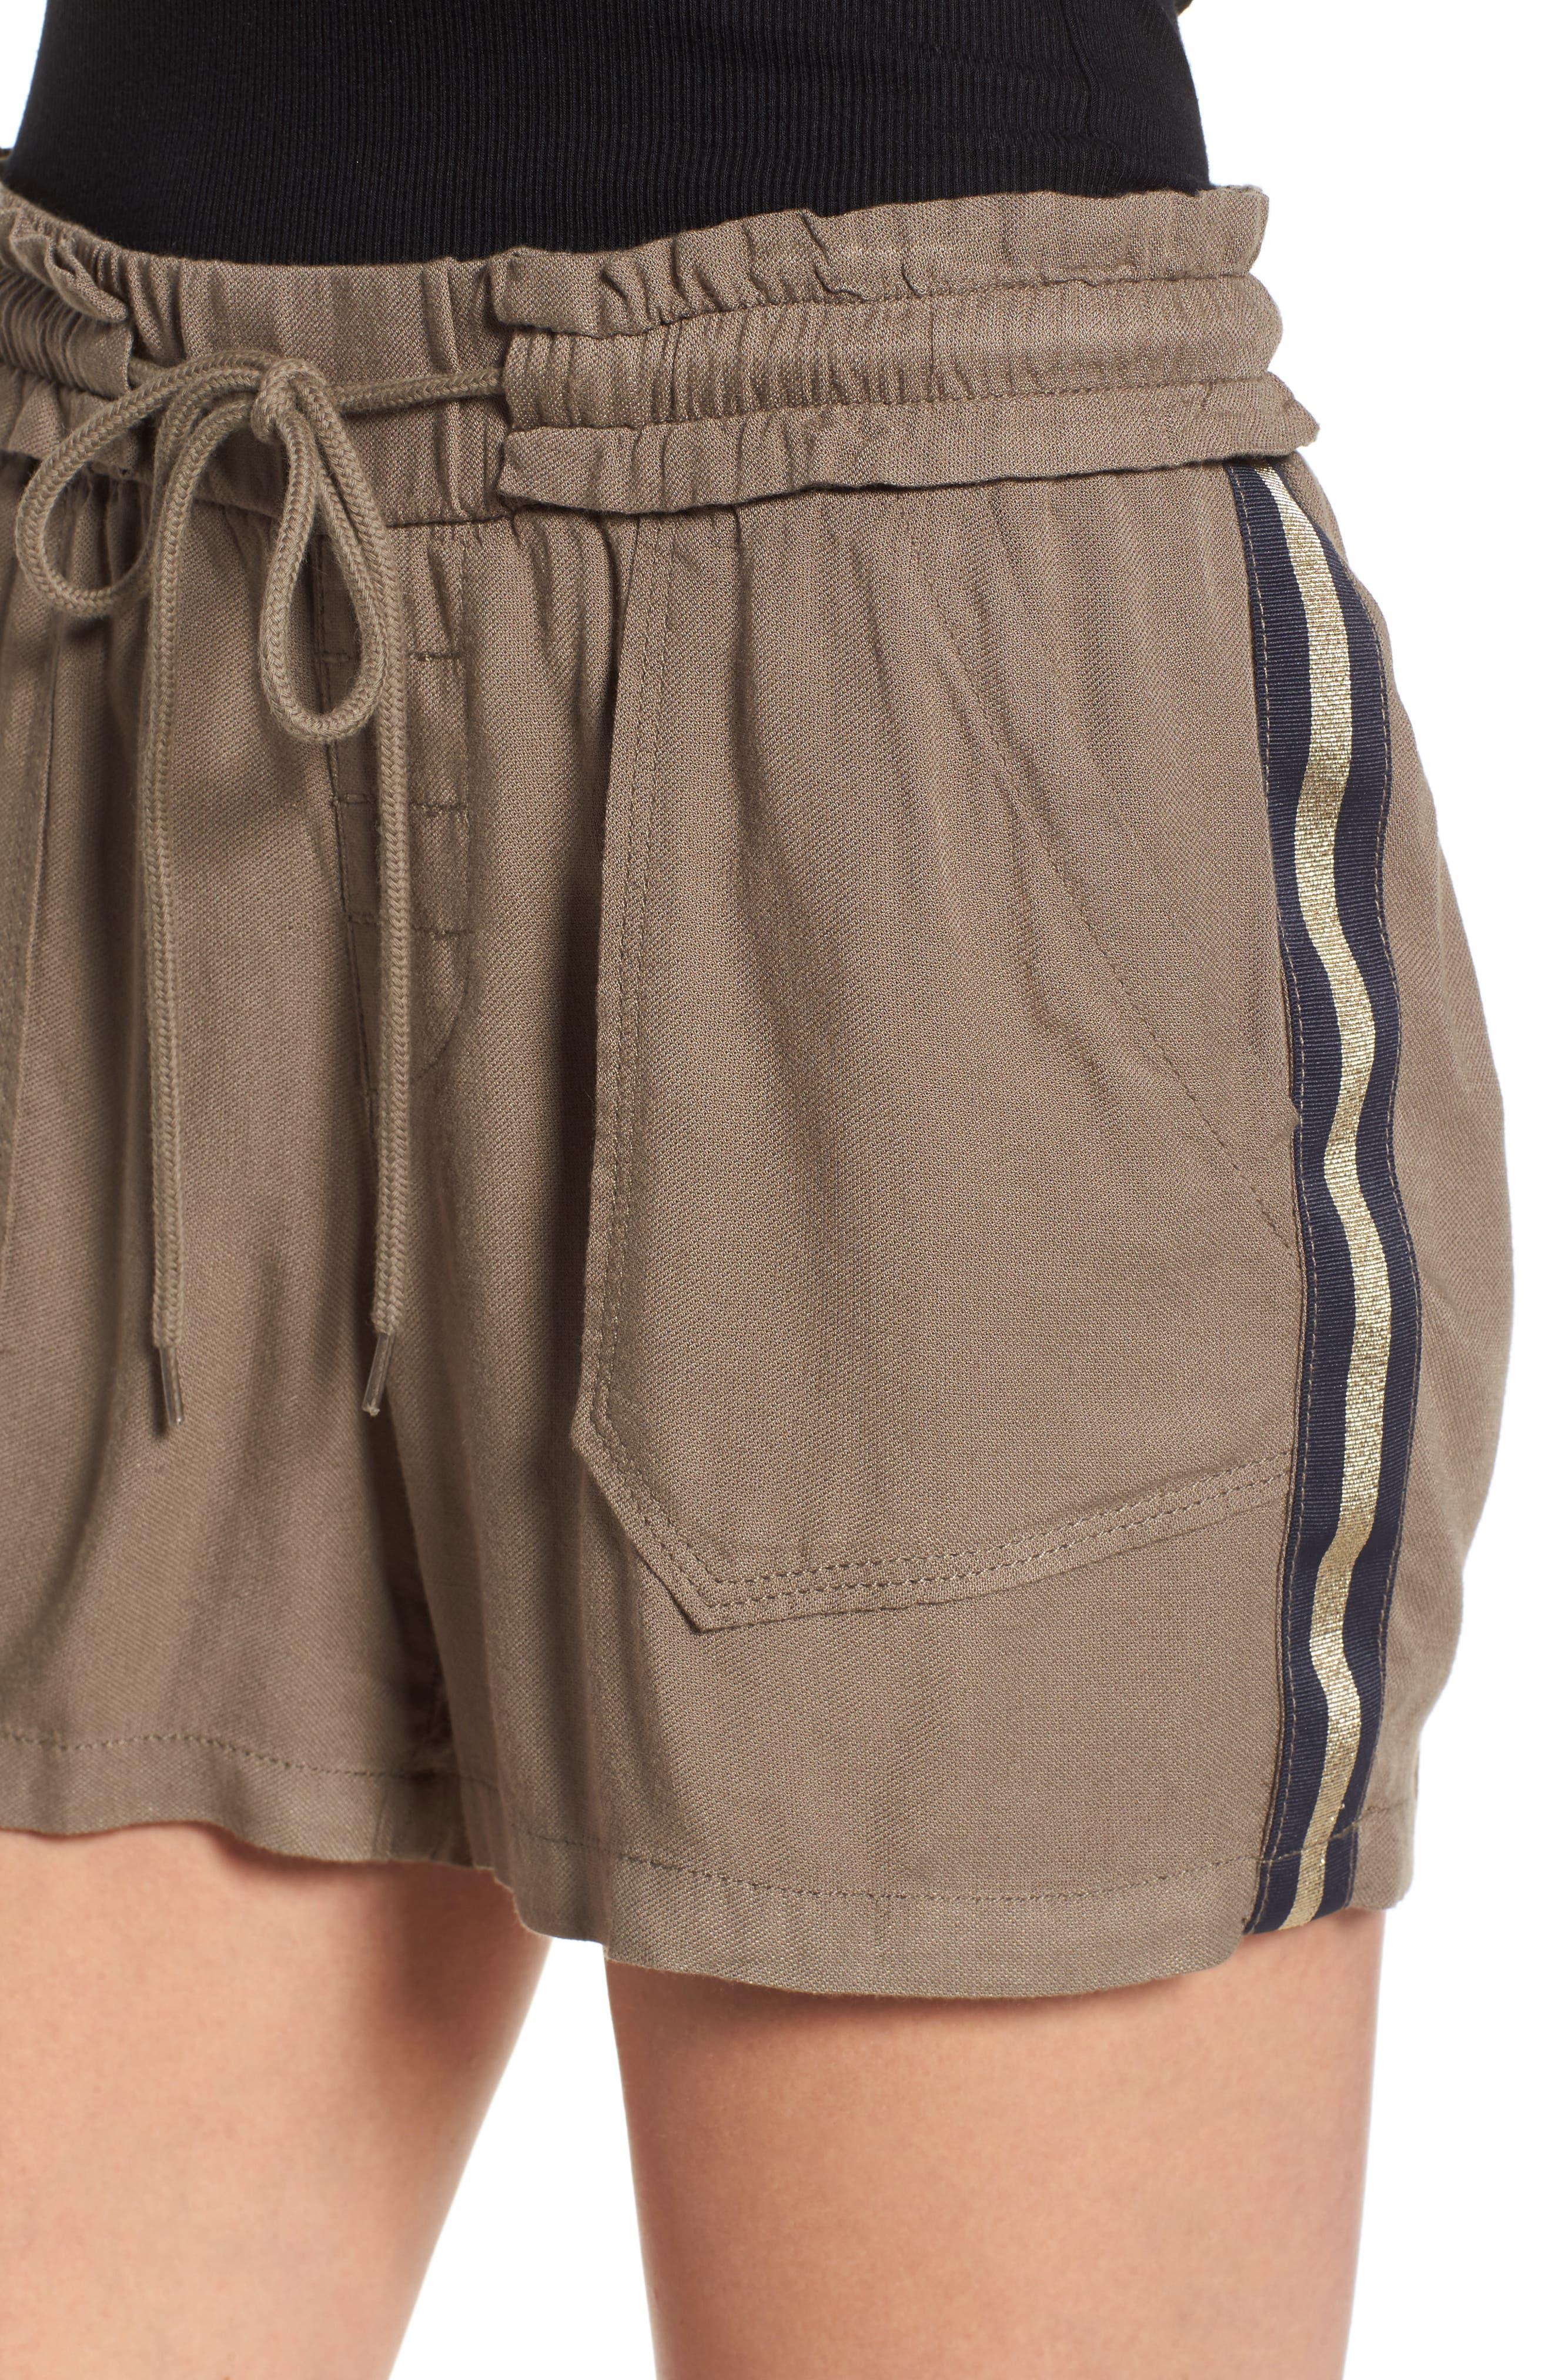 Drawstring Shorts,                             Alternate thumbnail 4, color,                             Brinde Olive